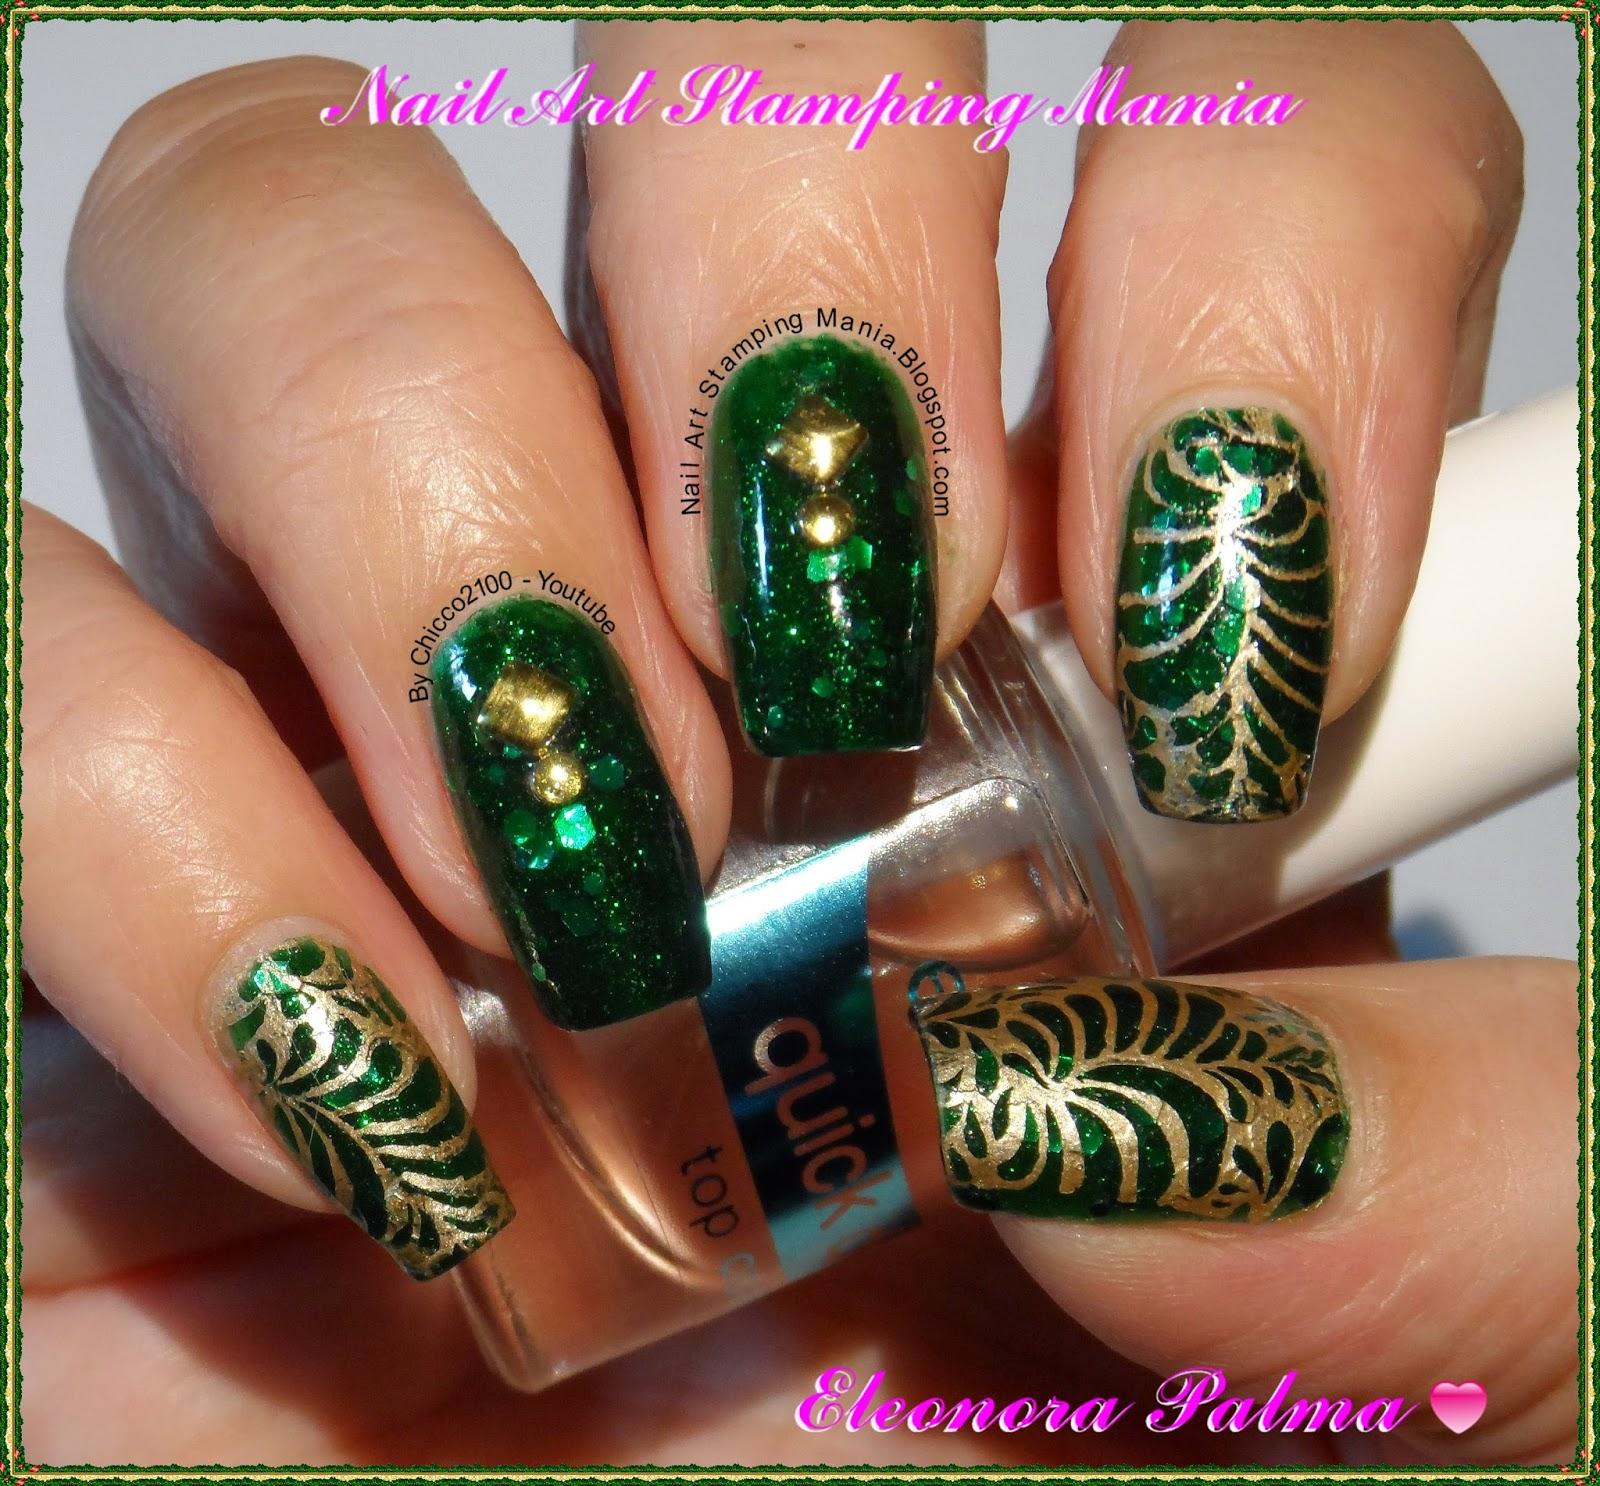 Nail Art Stamping Mania: Layla CE 54 + Infinity 42 And Aliexpress ...